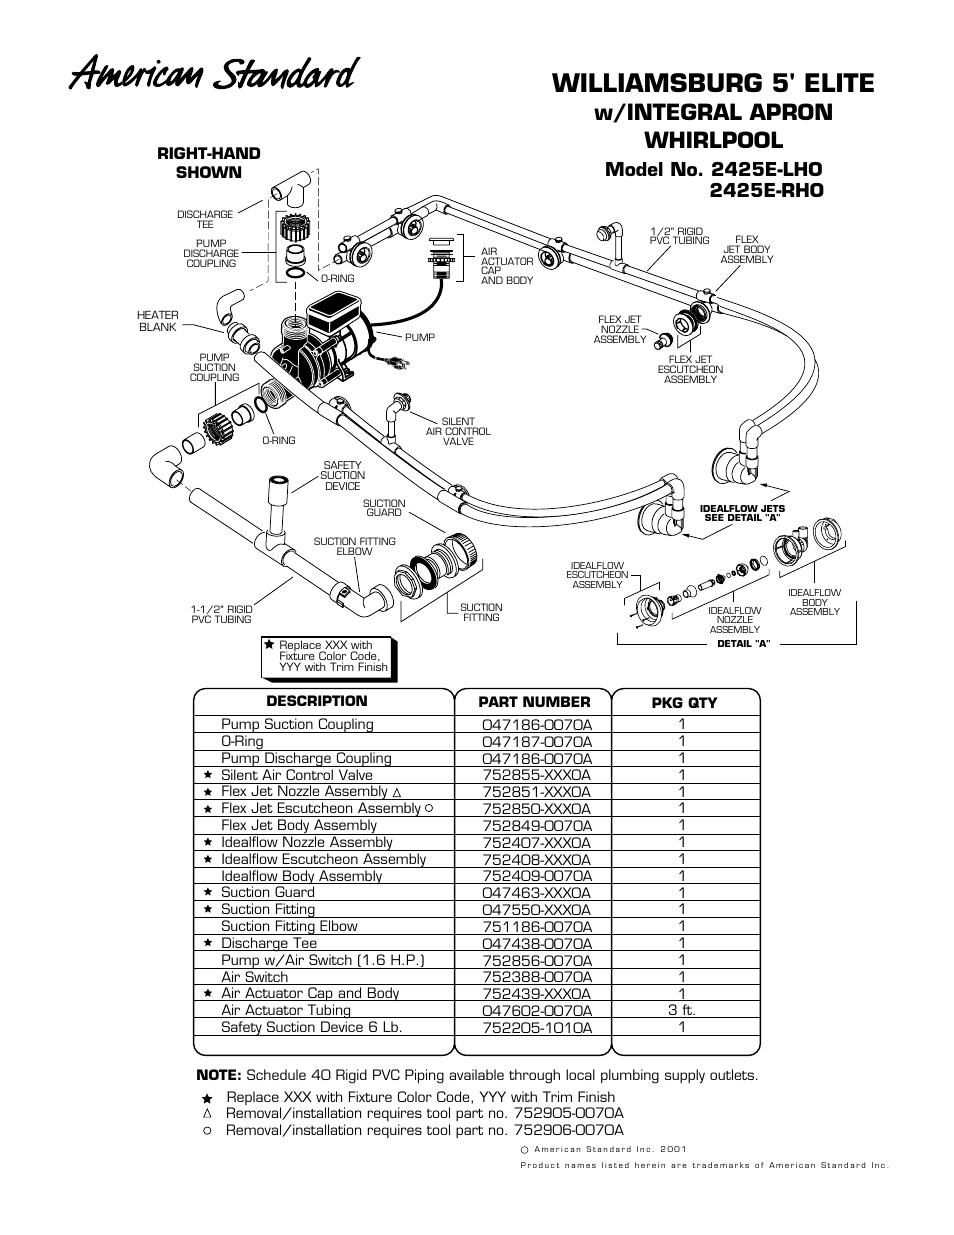 American Standard Williamsburg Elite 5' Integral Apron